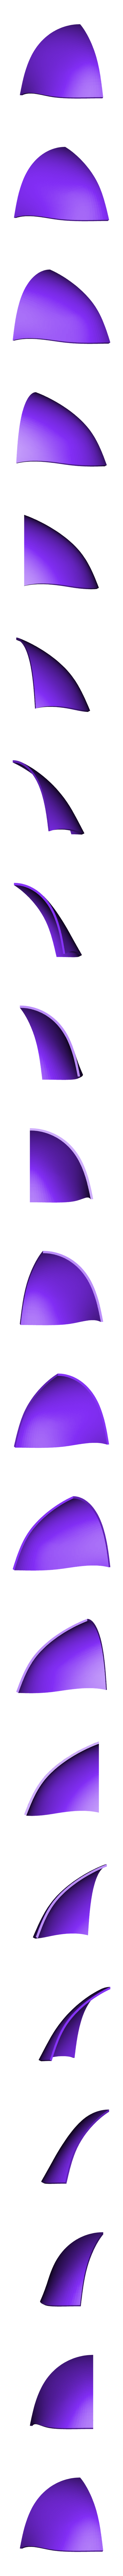 Part_13_v2_5.stl Download free STL file  Iron Musketeer's Helmet (Final Fantasy XI) • 3D printable design, VillainousPropShop